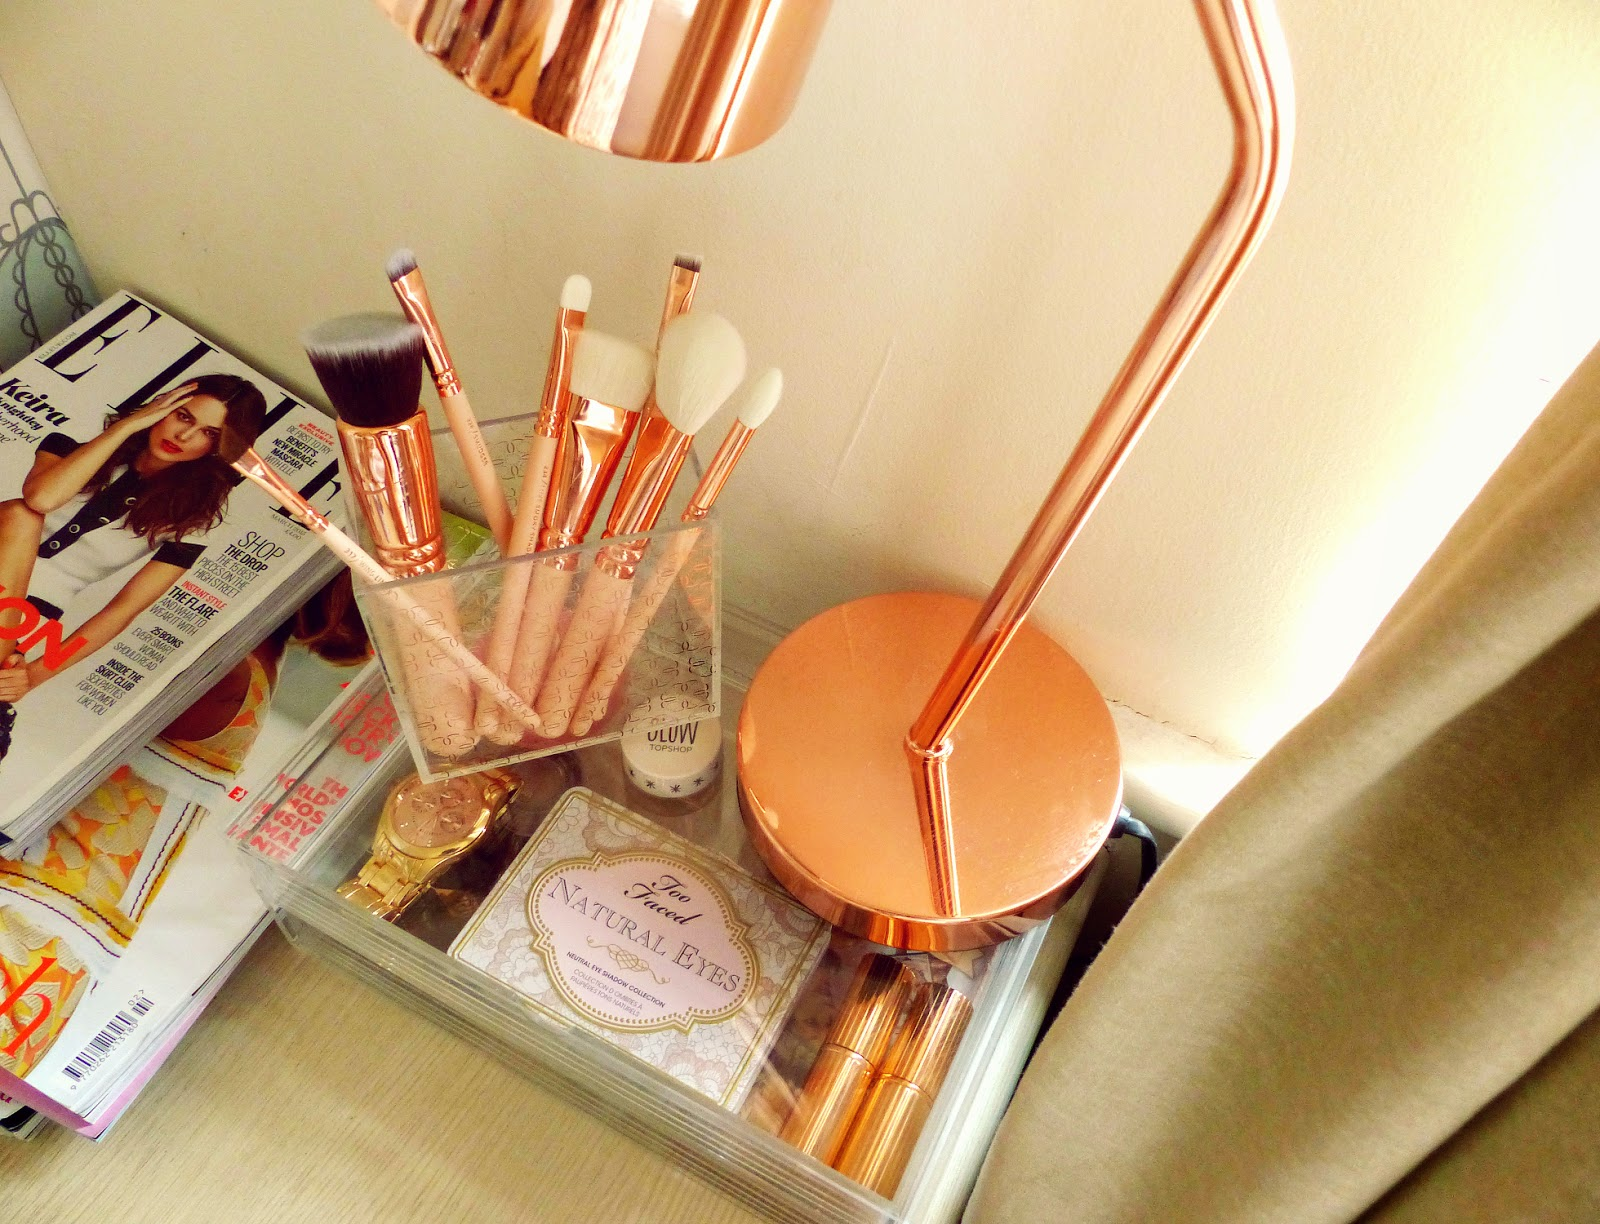 new zoeva rose golden volume 2 luxury brush set holder. Black Bedroom Furniture Sets. Home Design Ideas